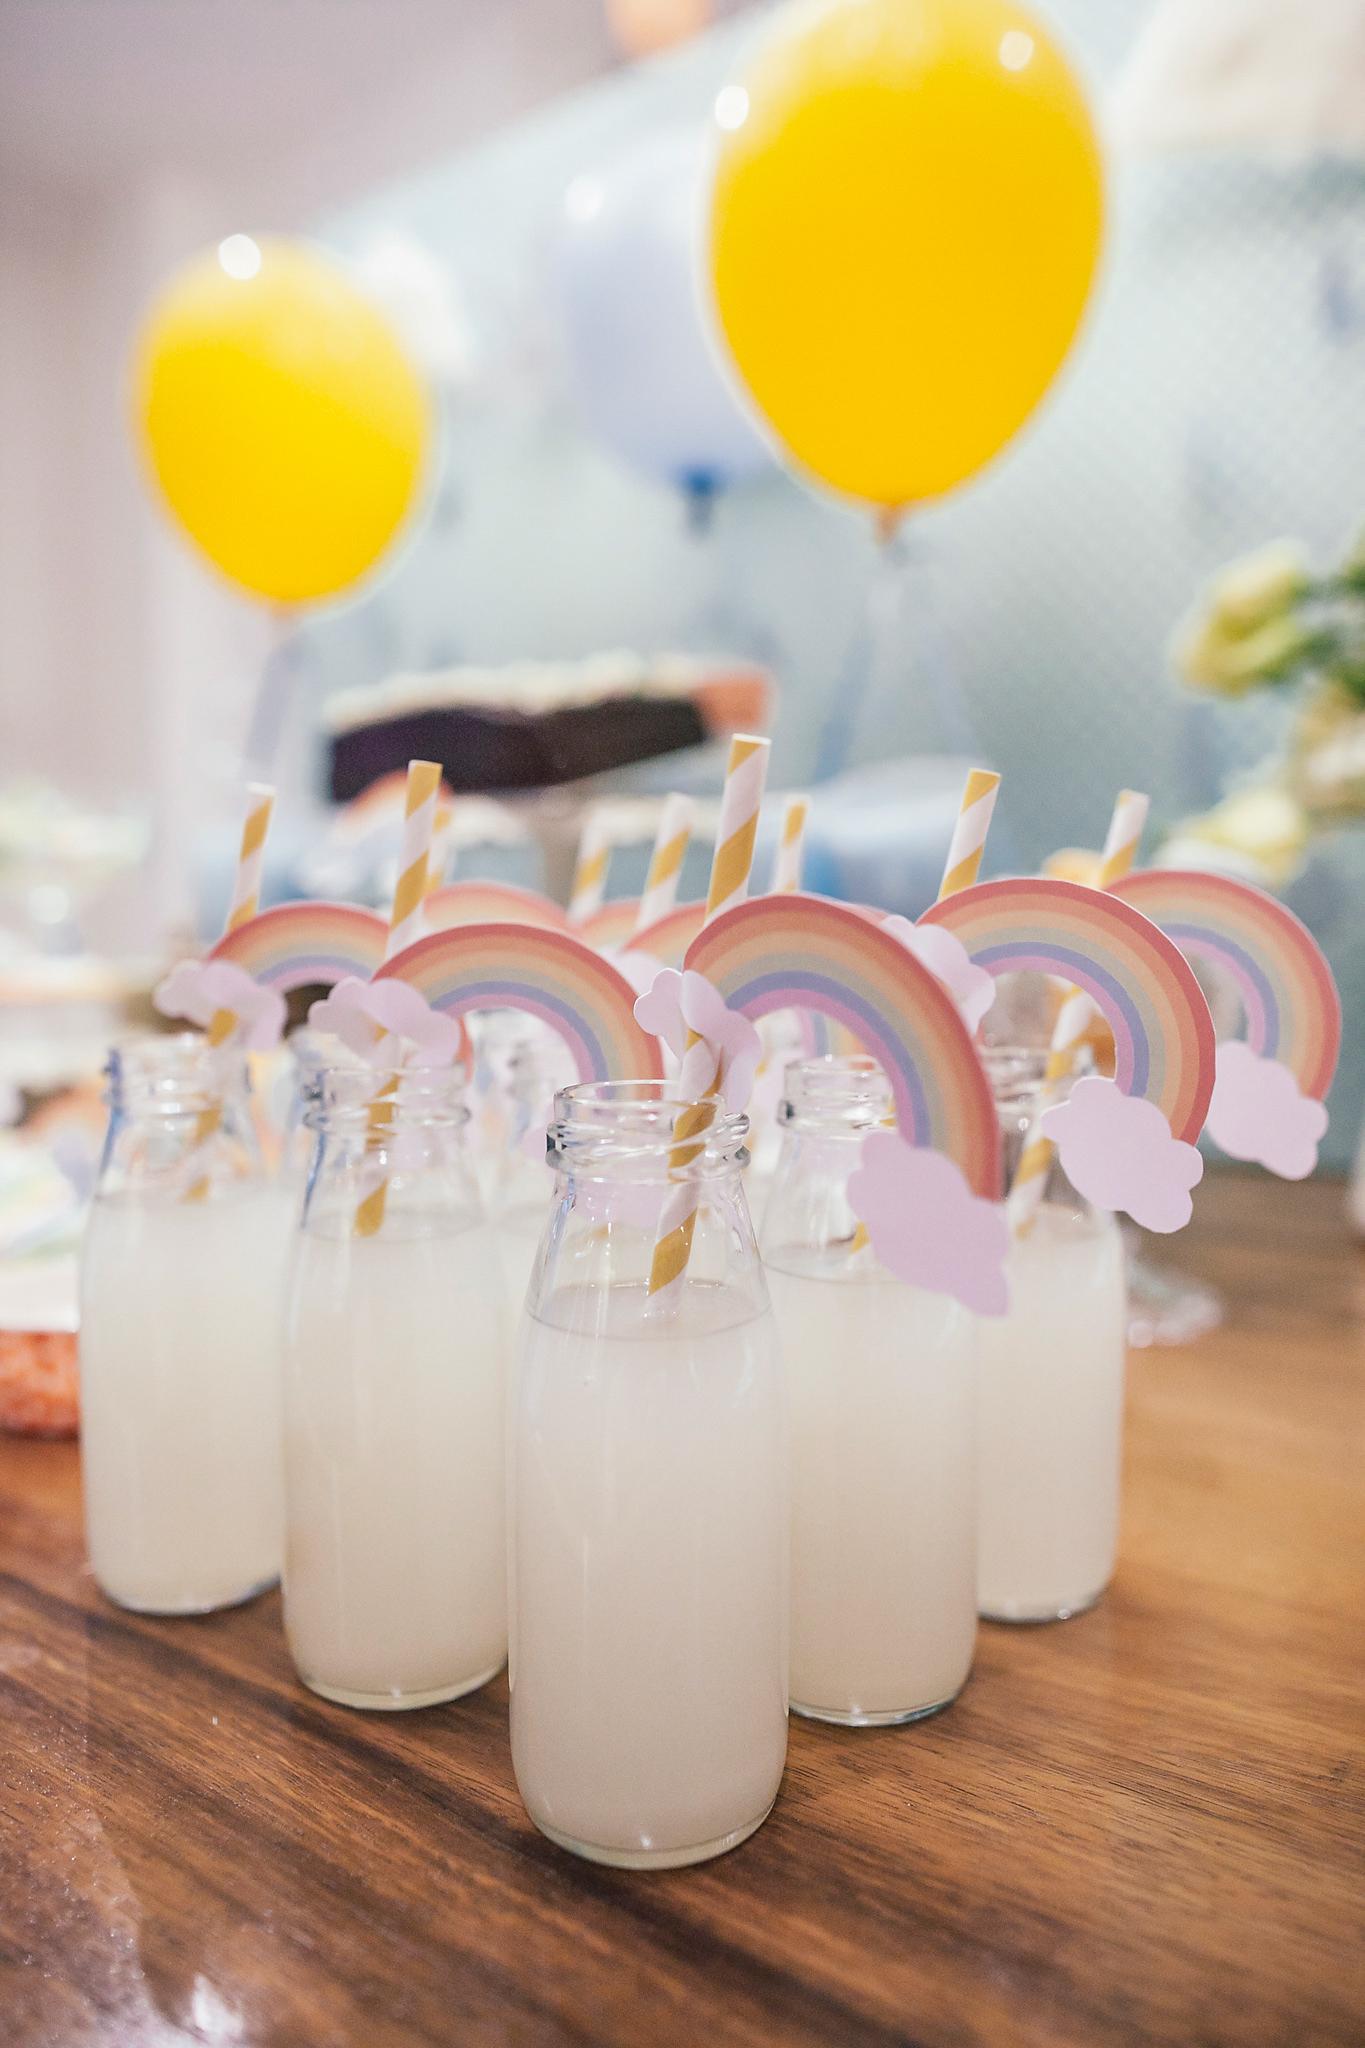 Lemonade jars with rainbow straws